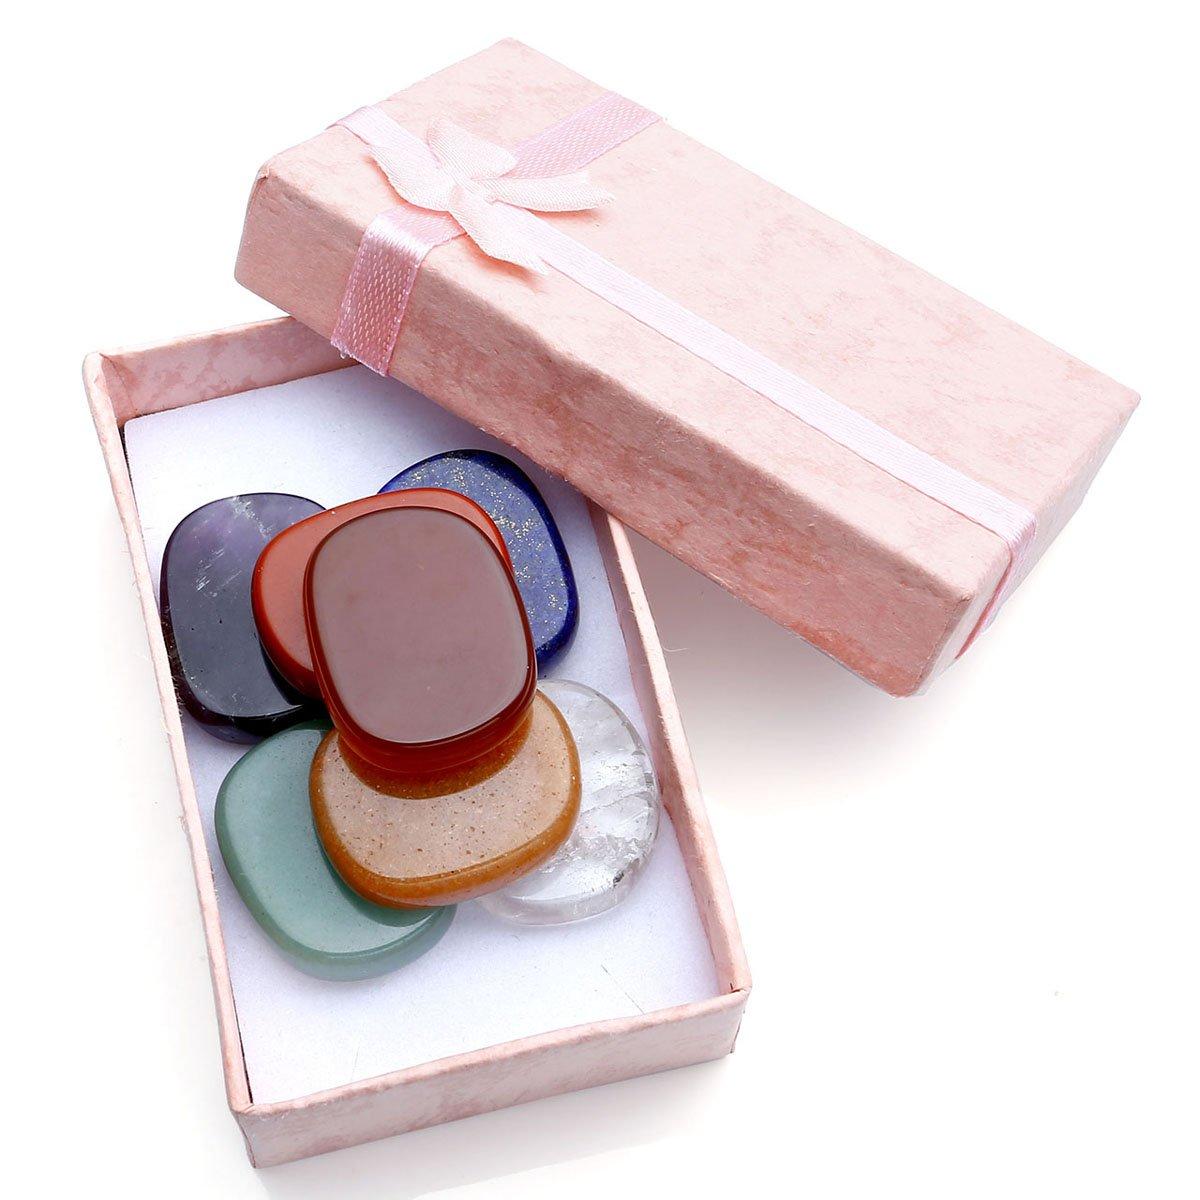 QGEM Healing Crystals Chakra Stones Reiki Palm Stone Decoration w/Box 7pcs Set